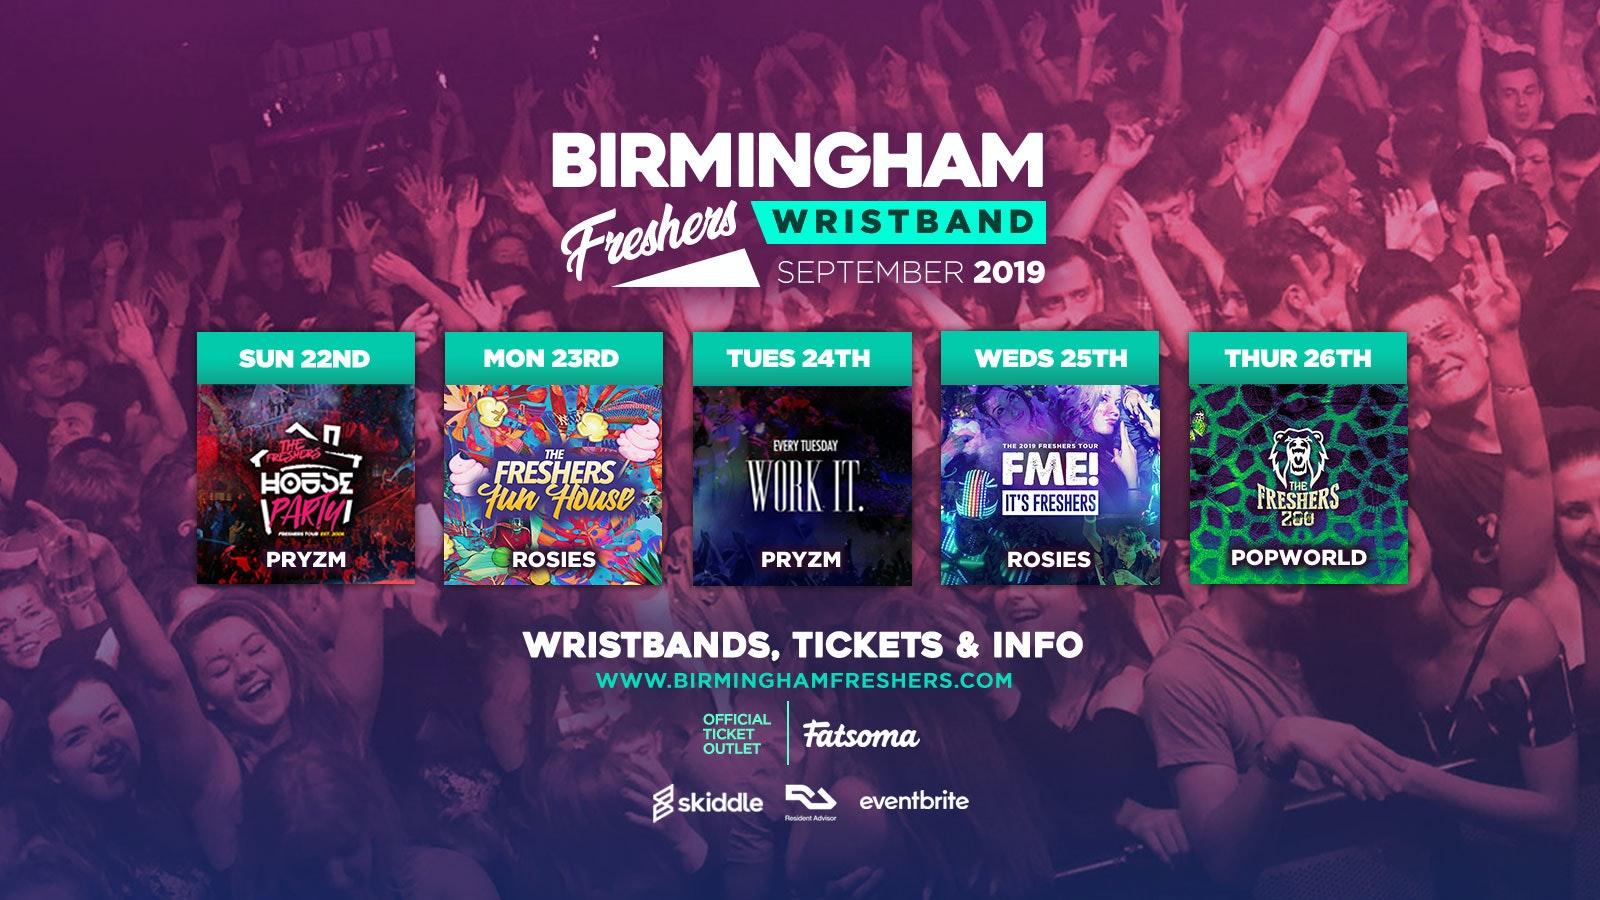 Birmingham Freshers Wristband 2019 ///